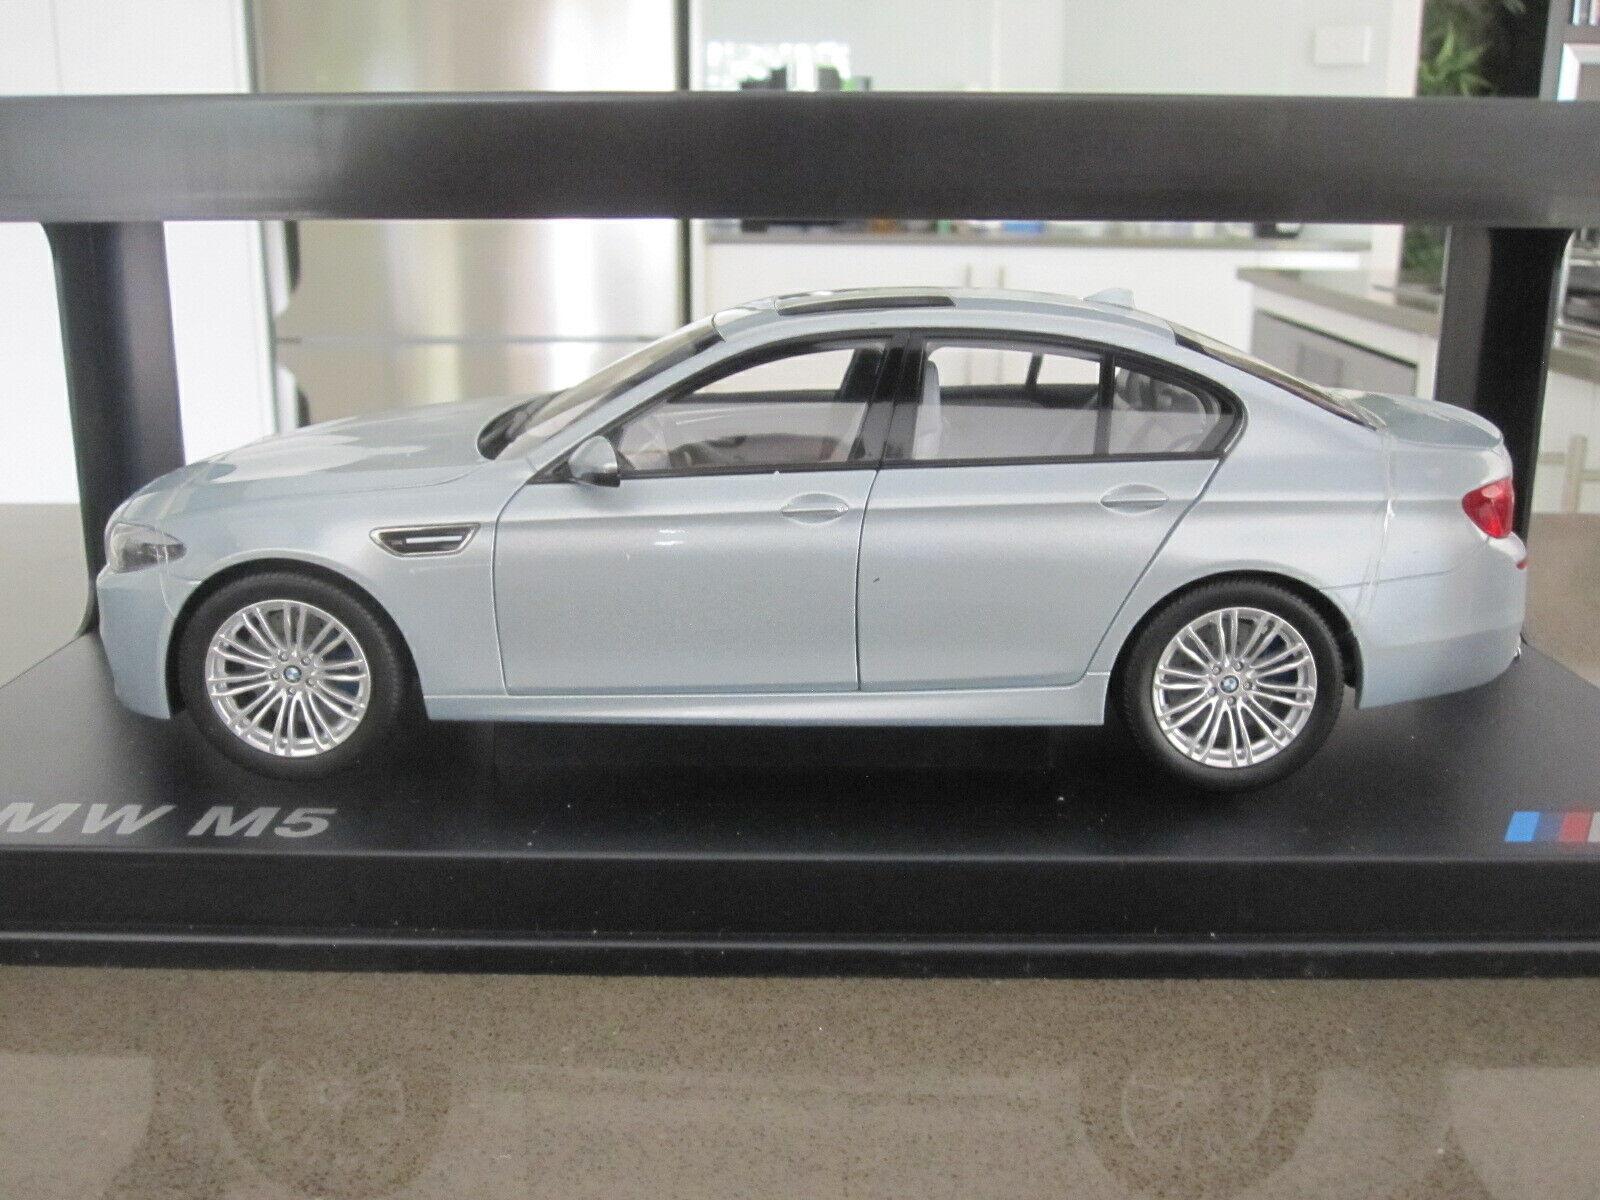 1 18 PARAGON BMW M5 BITURBO F10 SEDAN SilberSTONE NEW